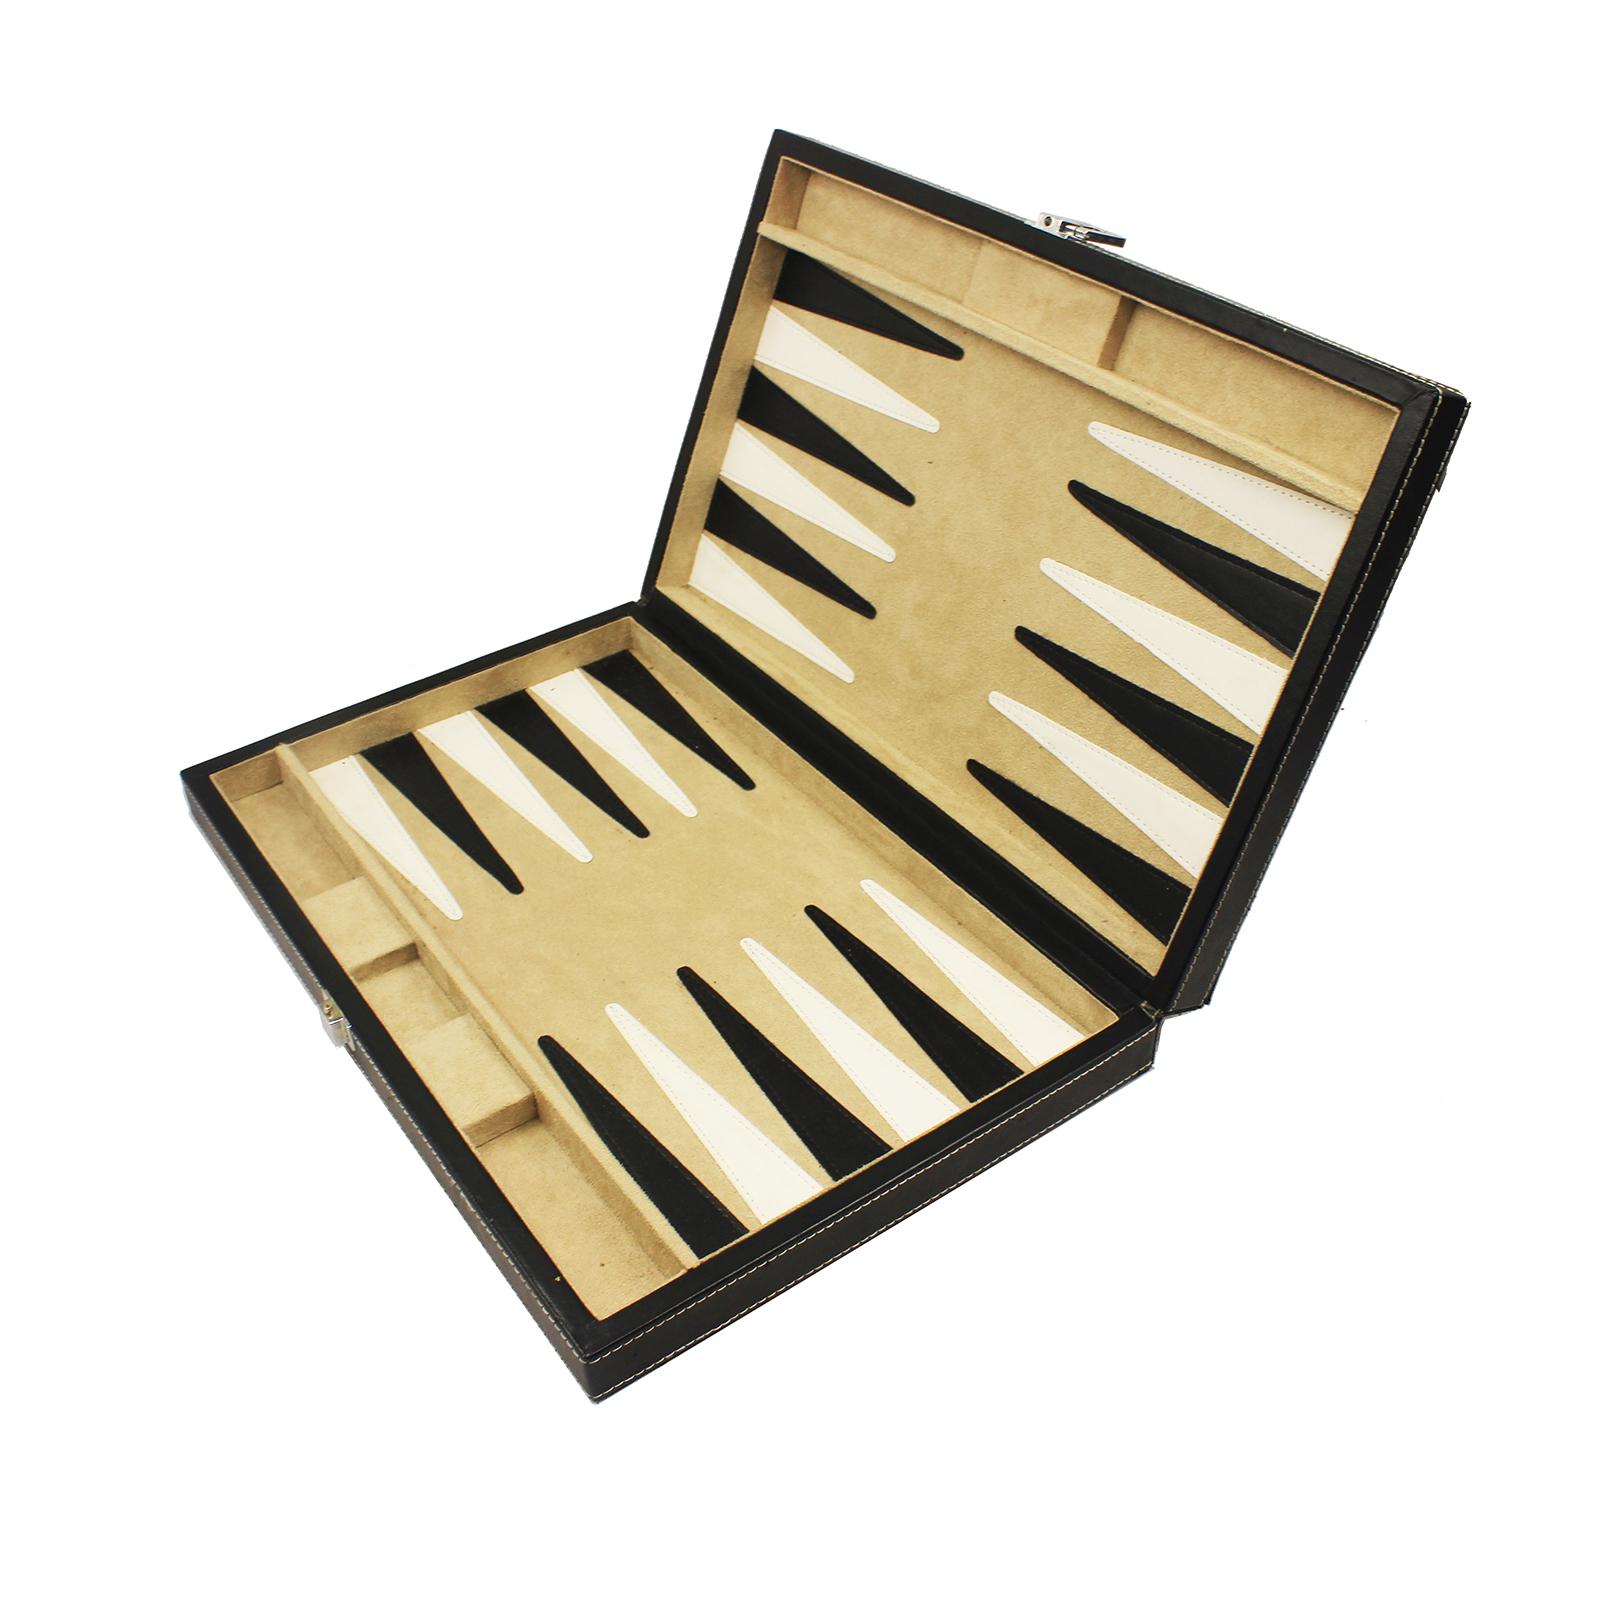 Luxury Handmade 15 / 21 Checkers Wooden Backgammon Set for Sale